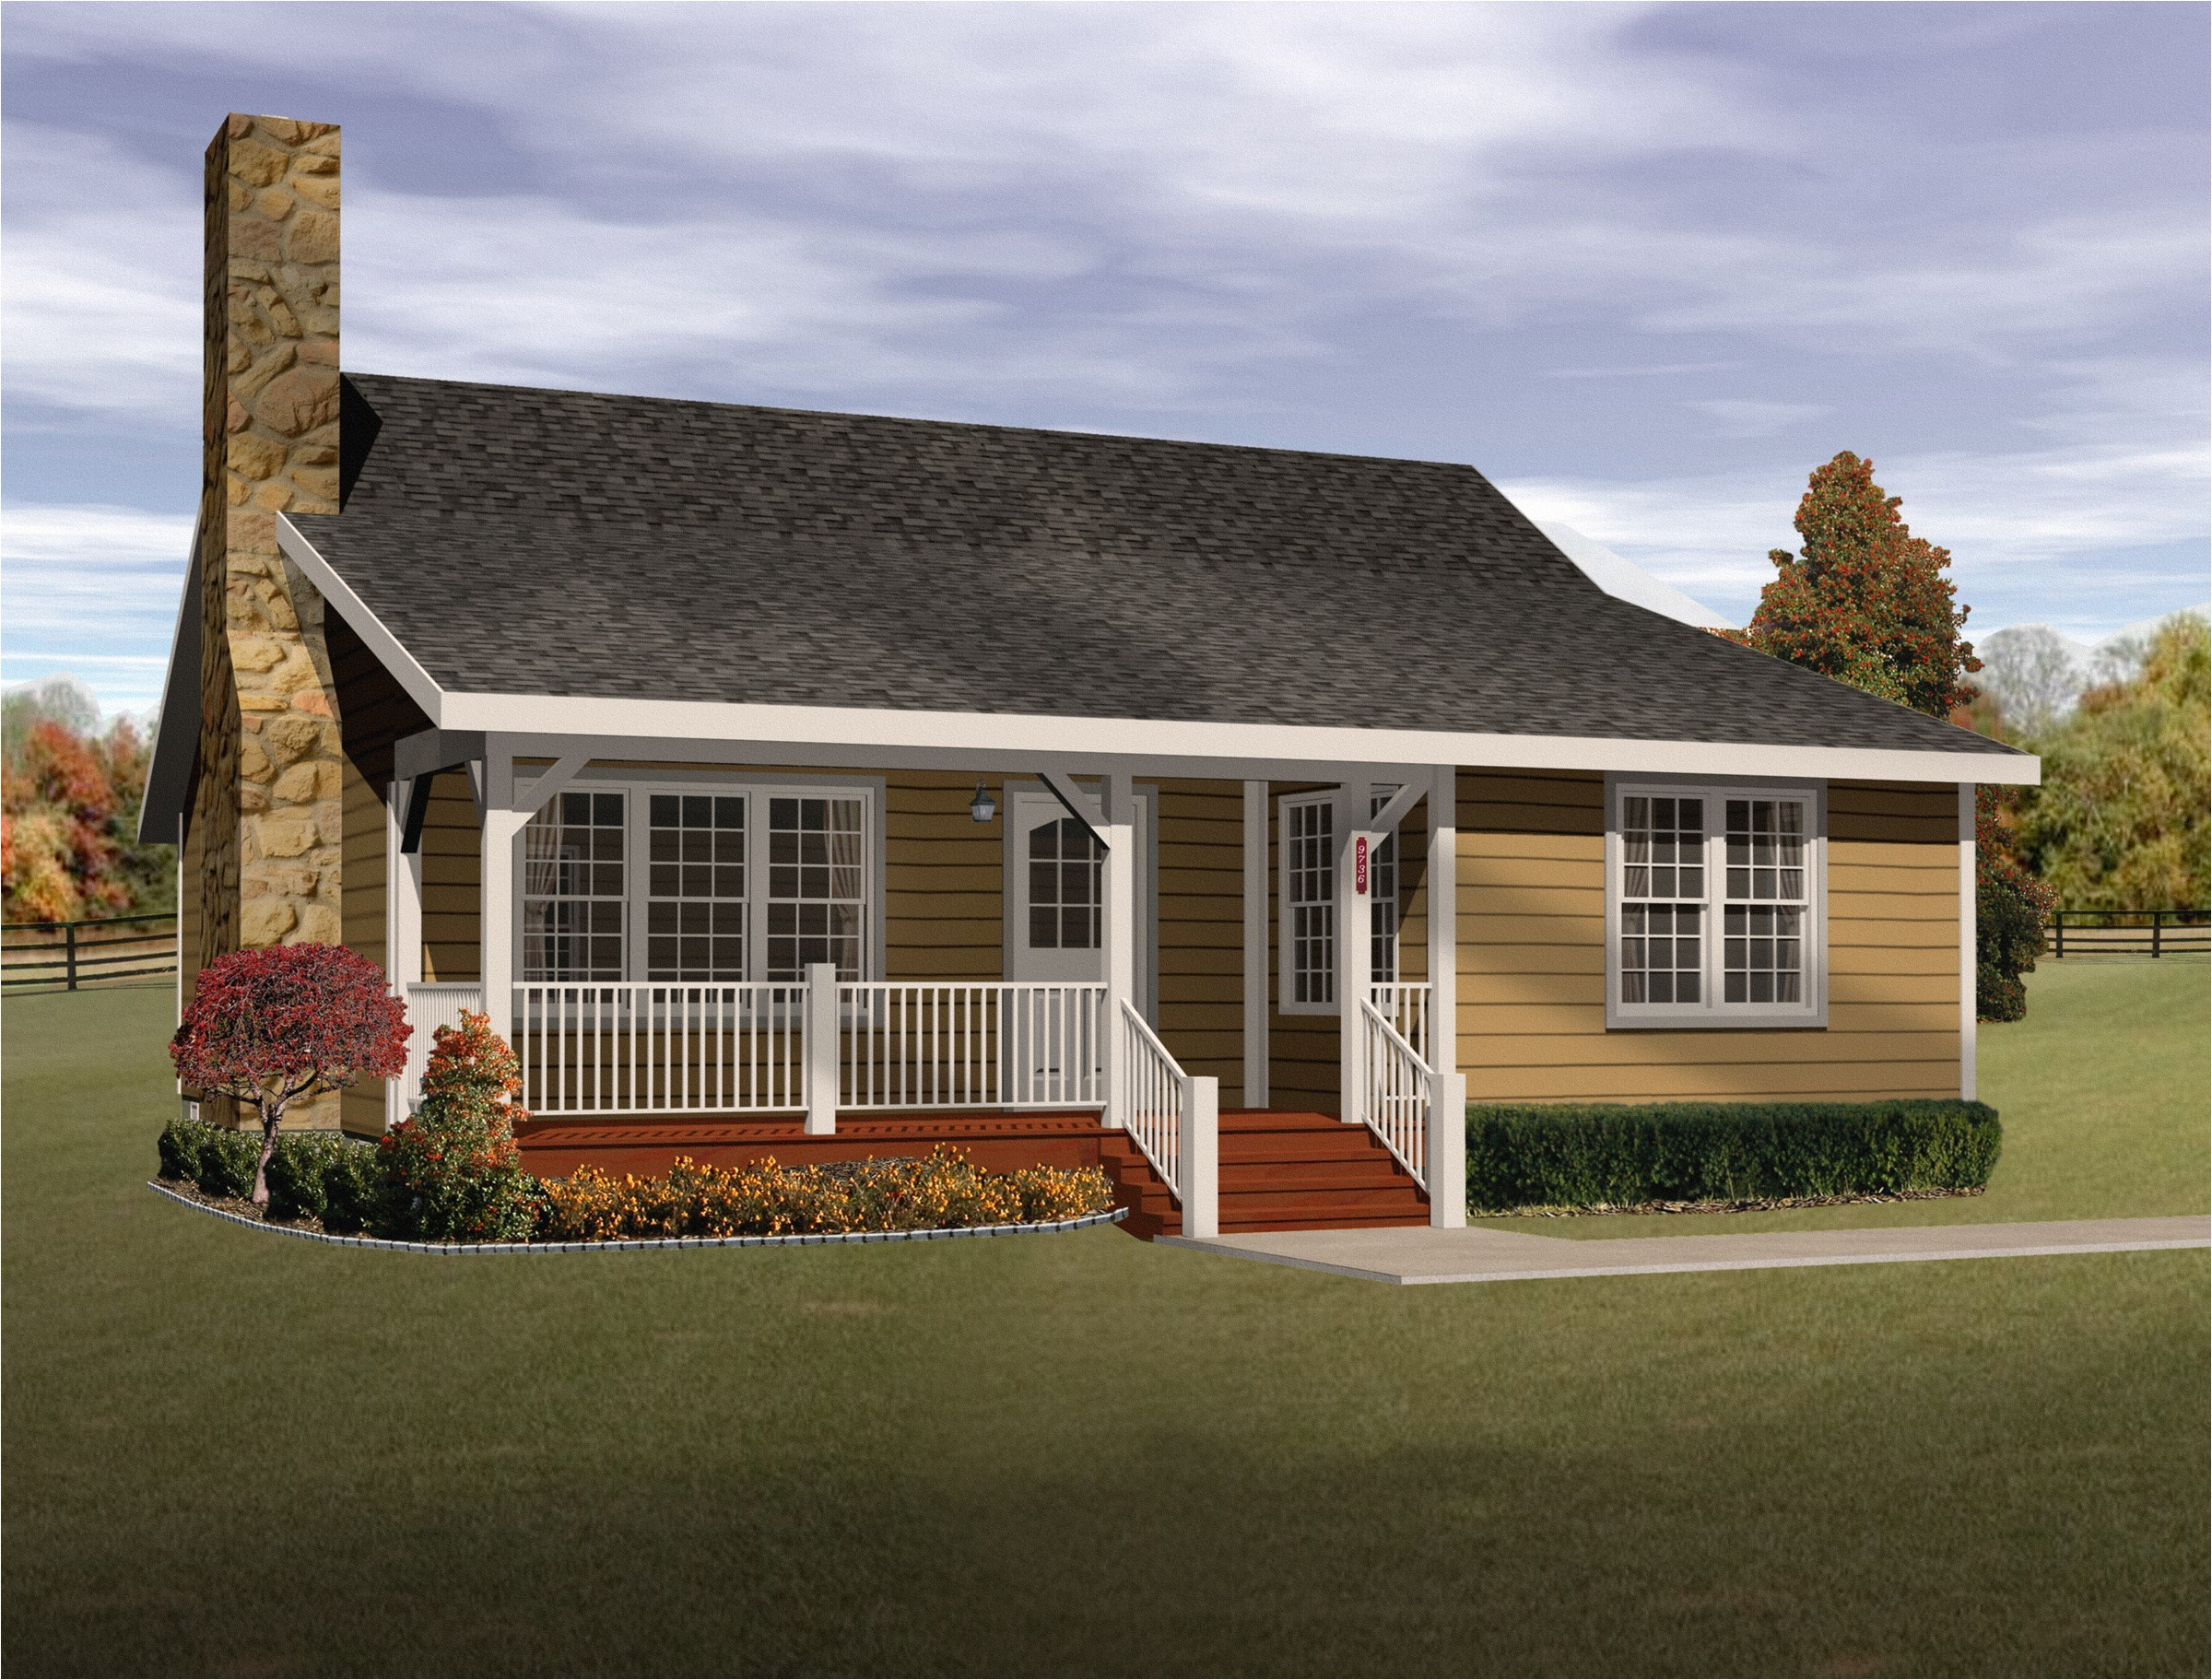 cozy cottage home plan 2256sl